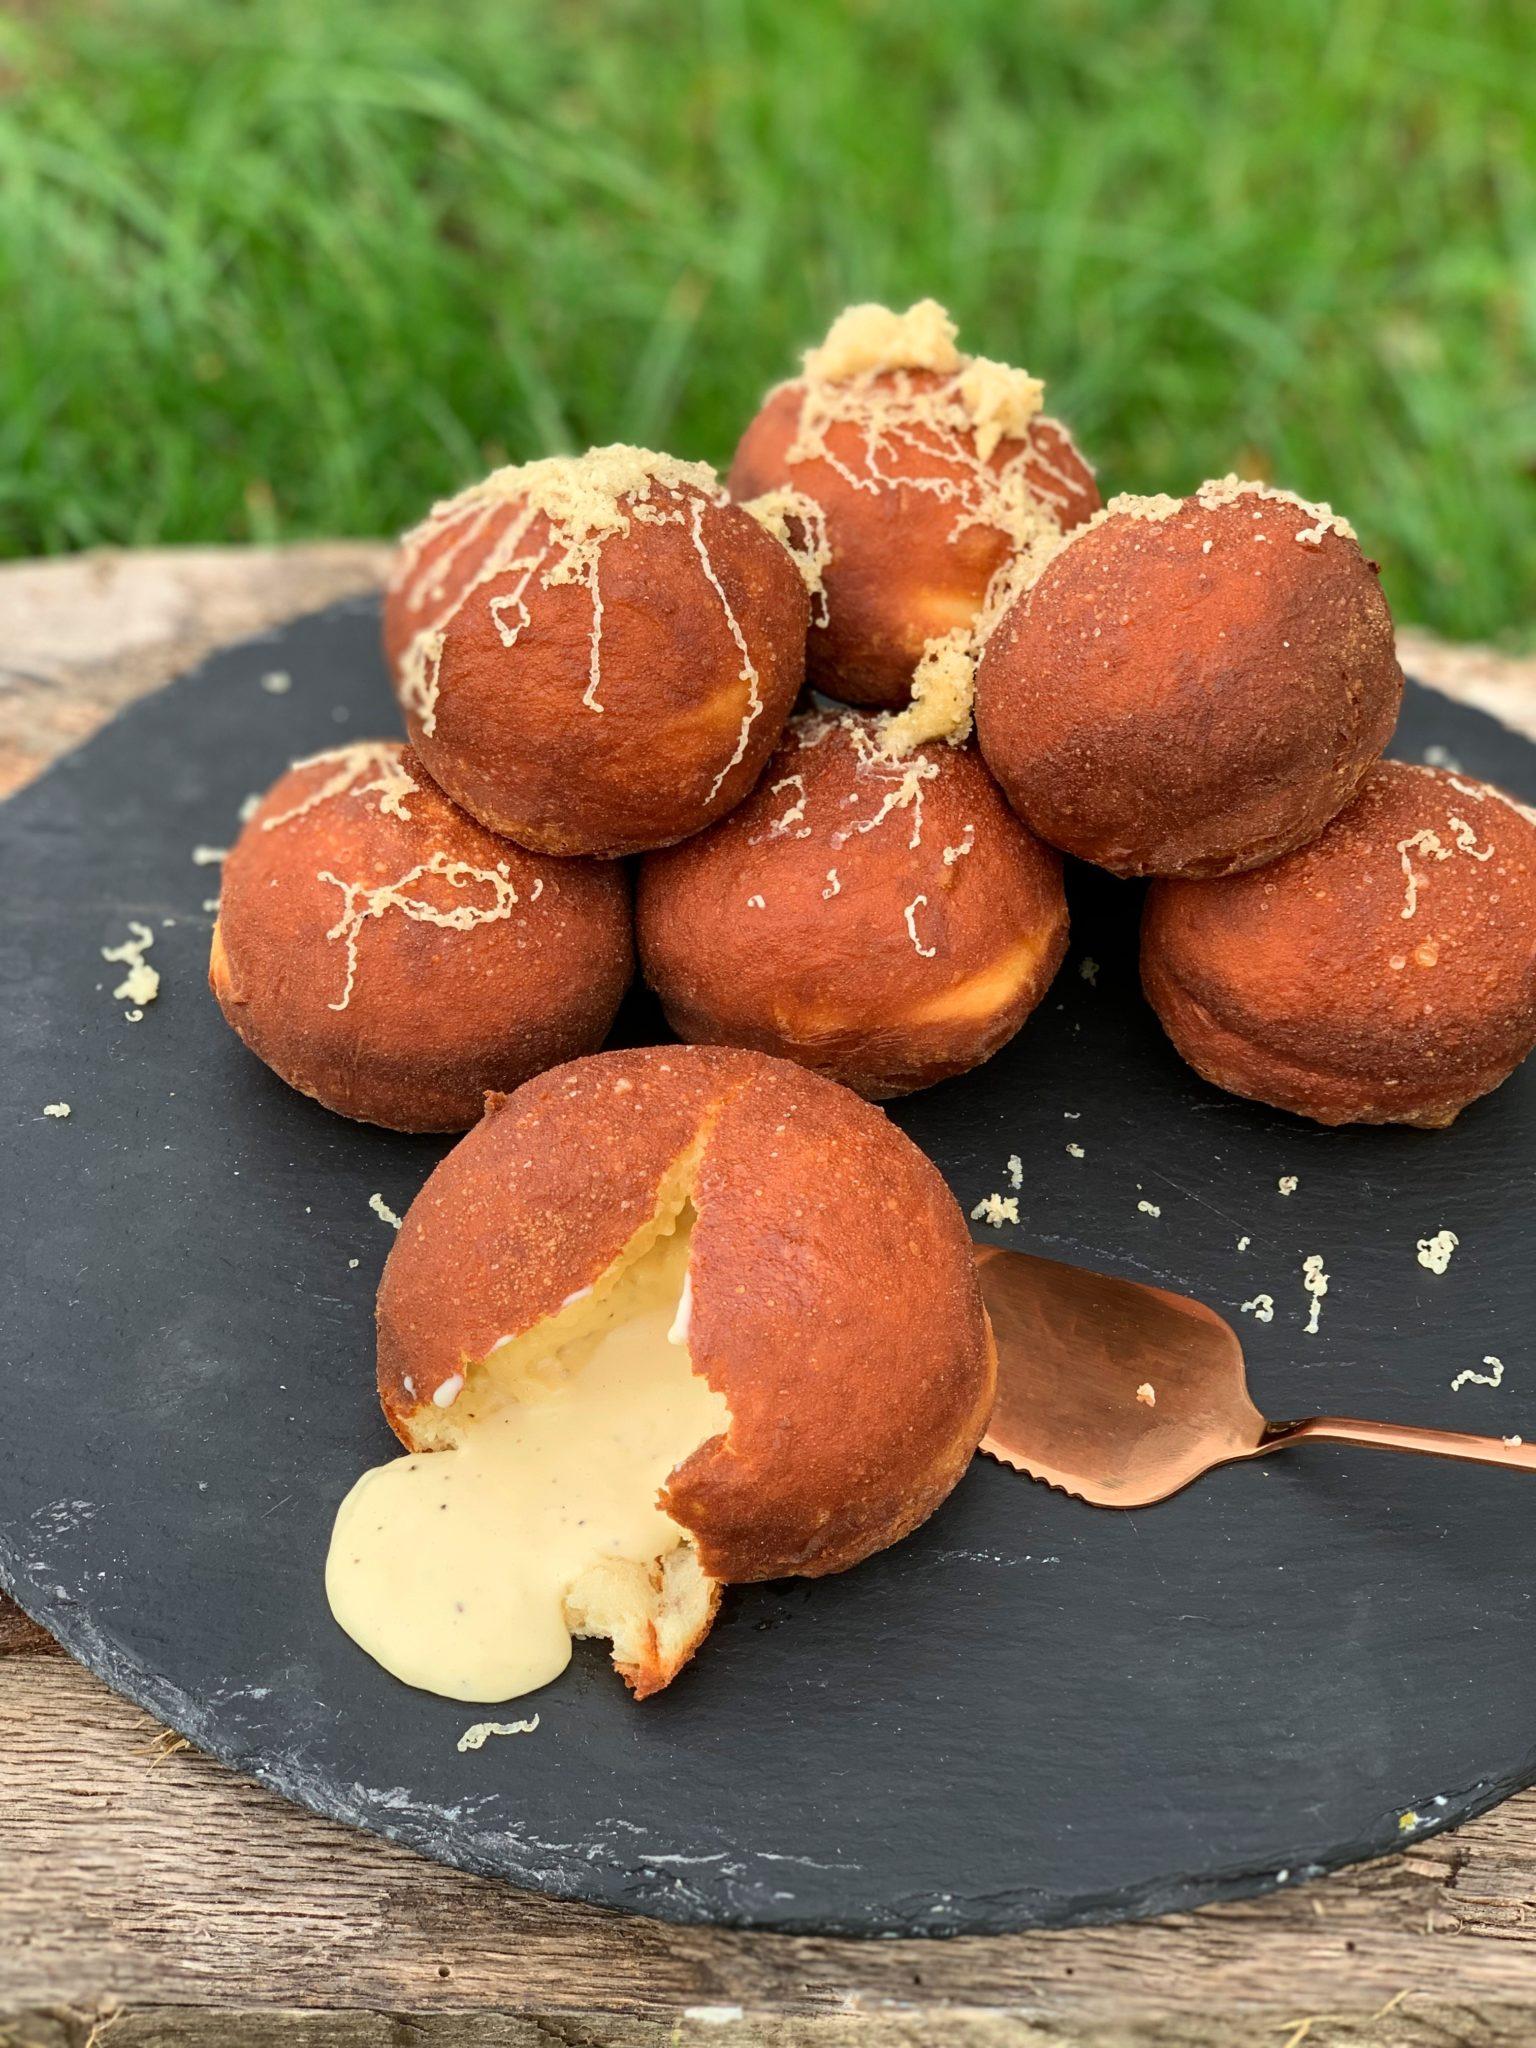 Godminster Black Truffle Doughnuts by Steve James